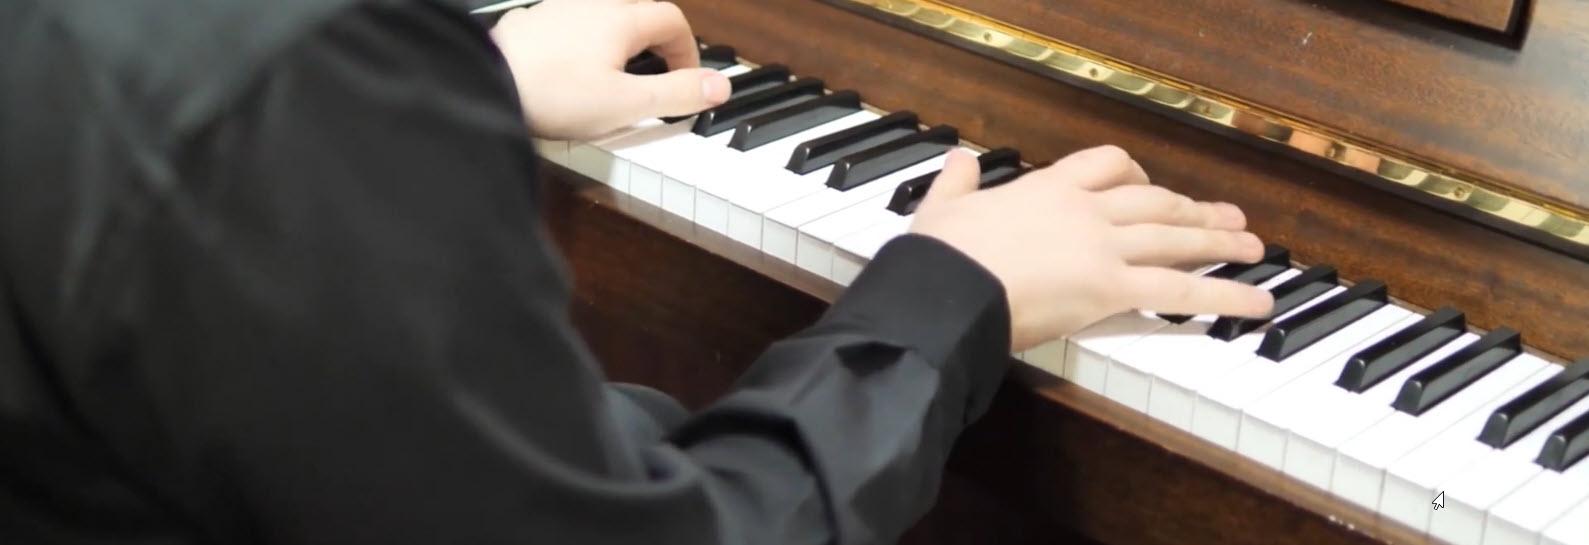 Nuryl - The Relationship Between Language, Music, and the Brain